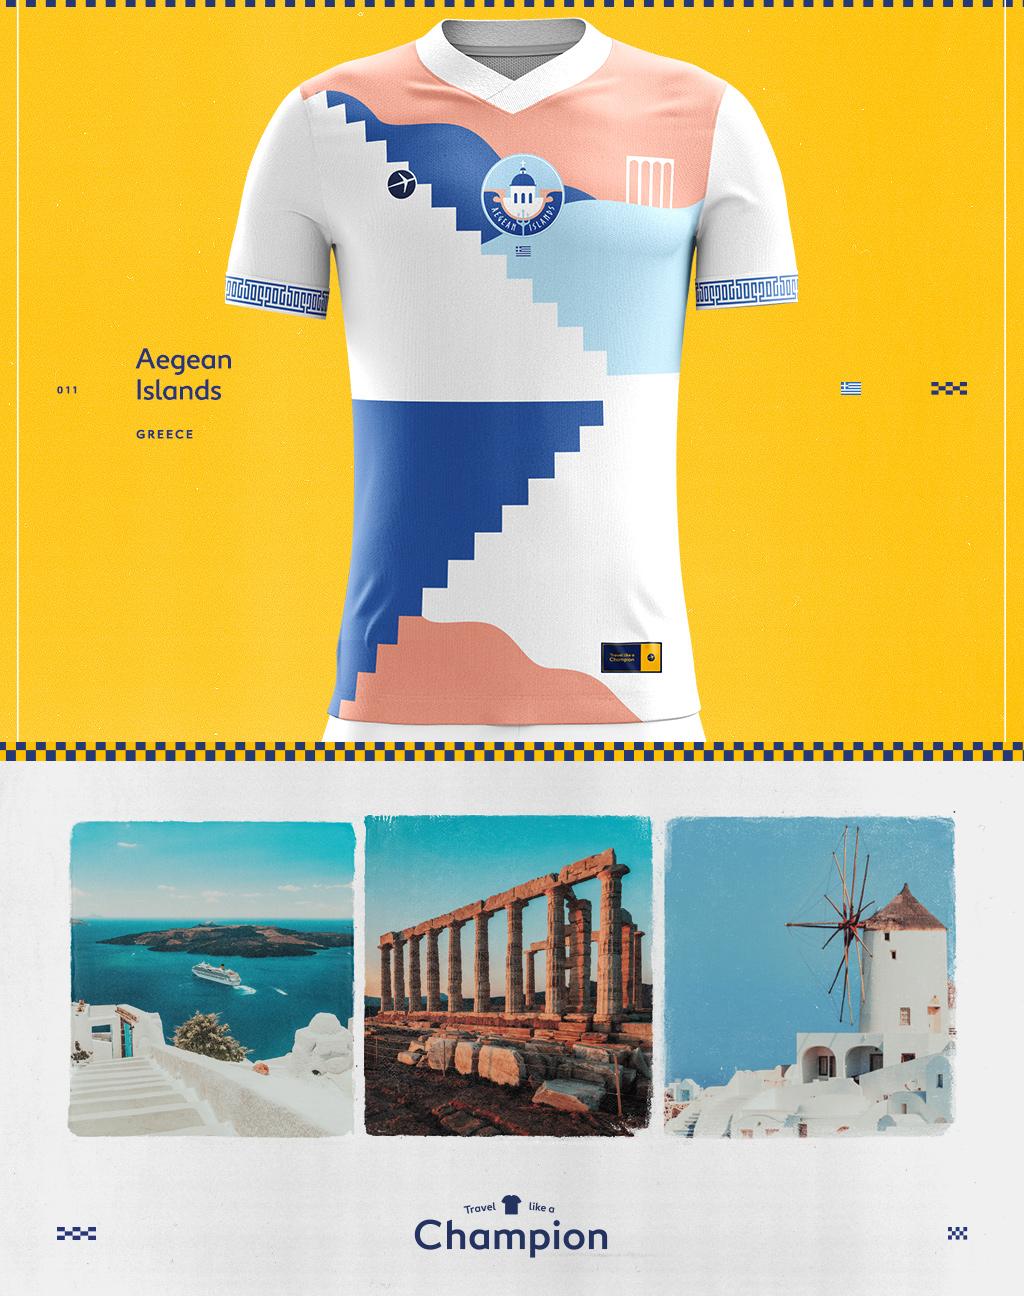 the aegean sea greece interpreted as a soccer jersey design